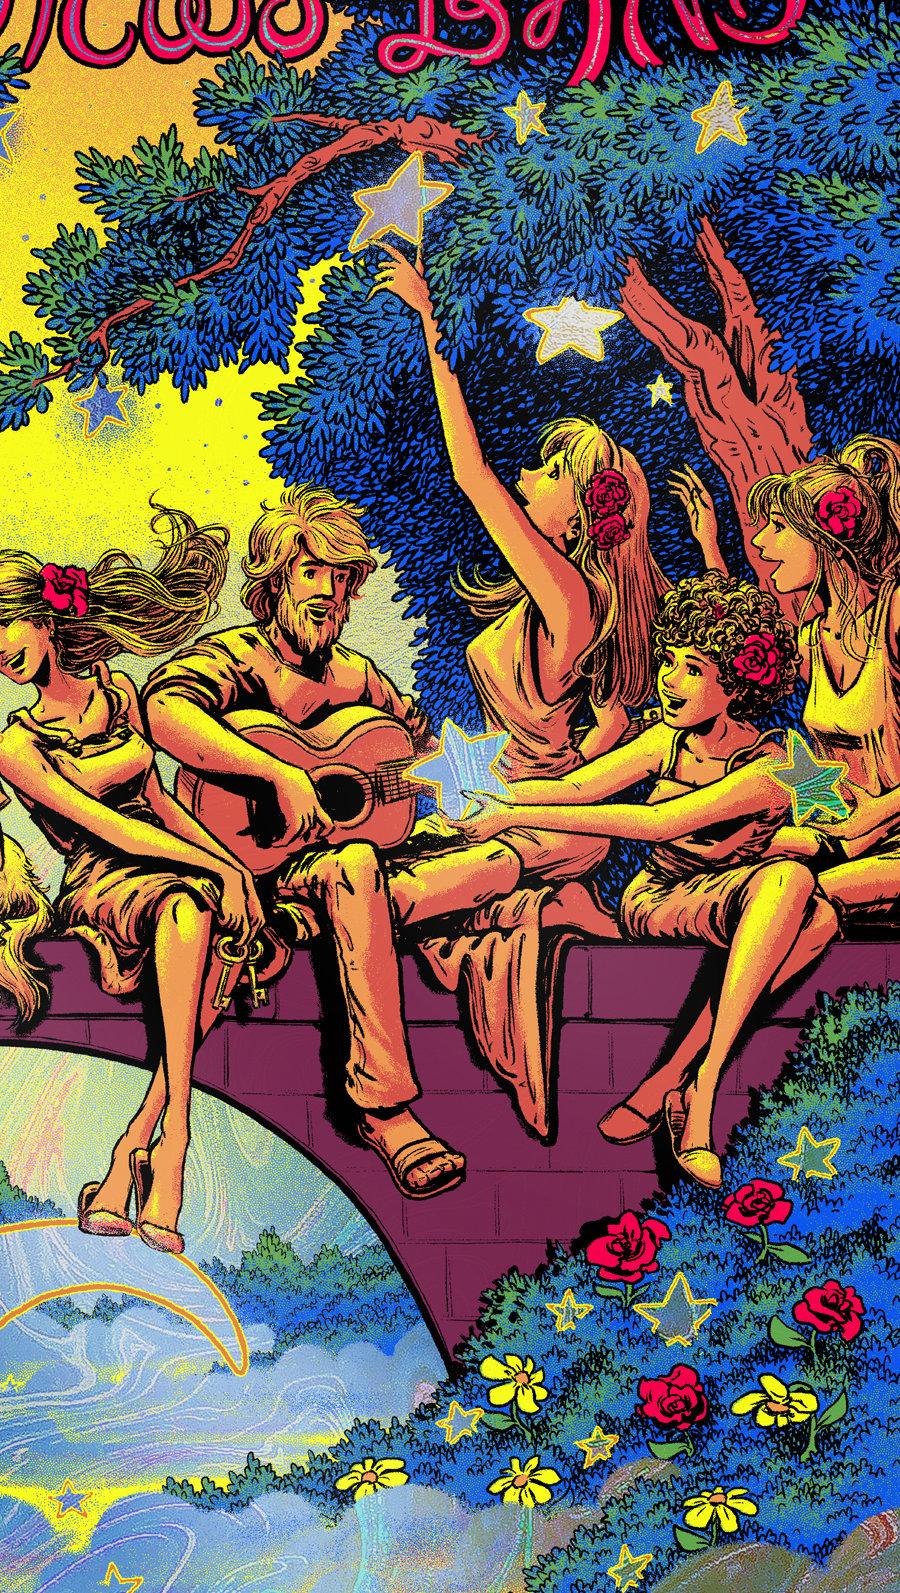 Image of Dave Matthews Band - Raleigh, NC 2021 - Hazy Waves HoloFoil